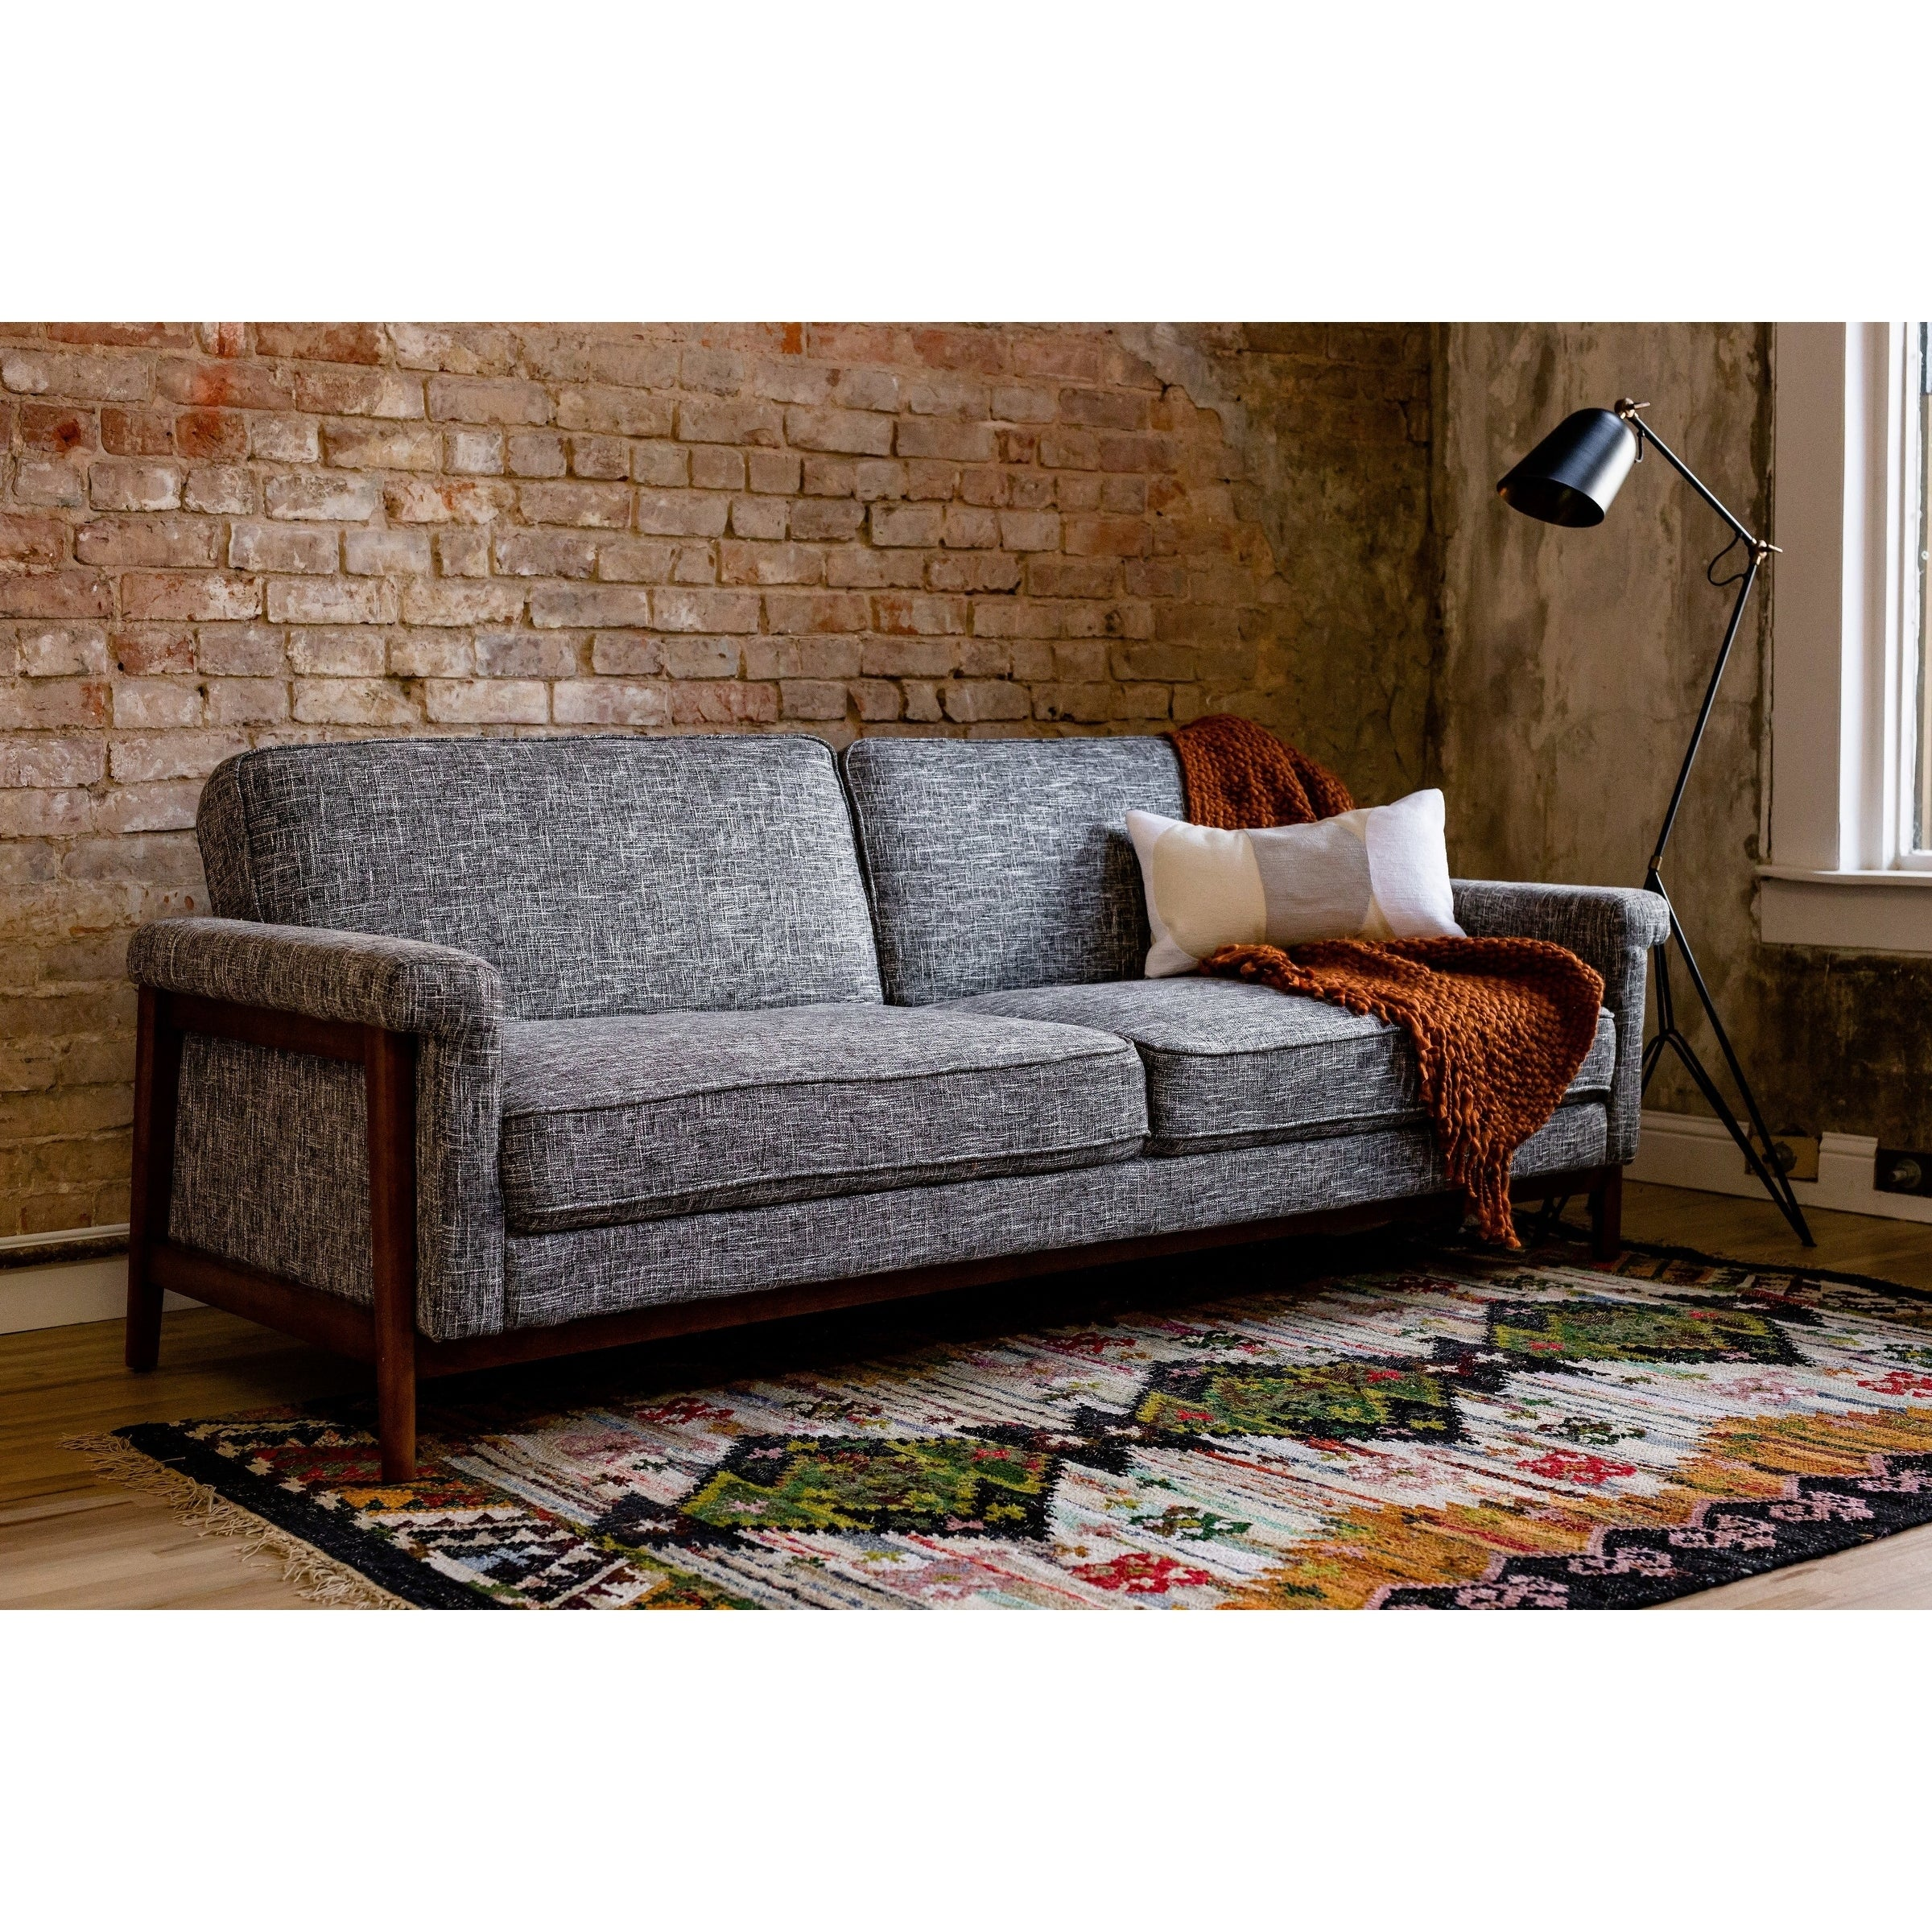 Shop Ainsley Mid Century Modern Grey Upholstered Sleeper Sofa Free